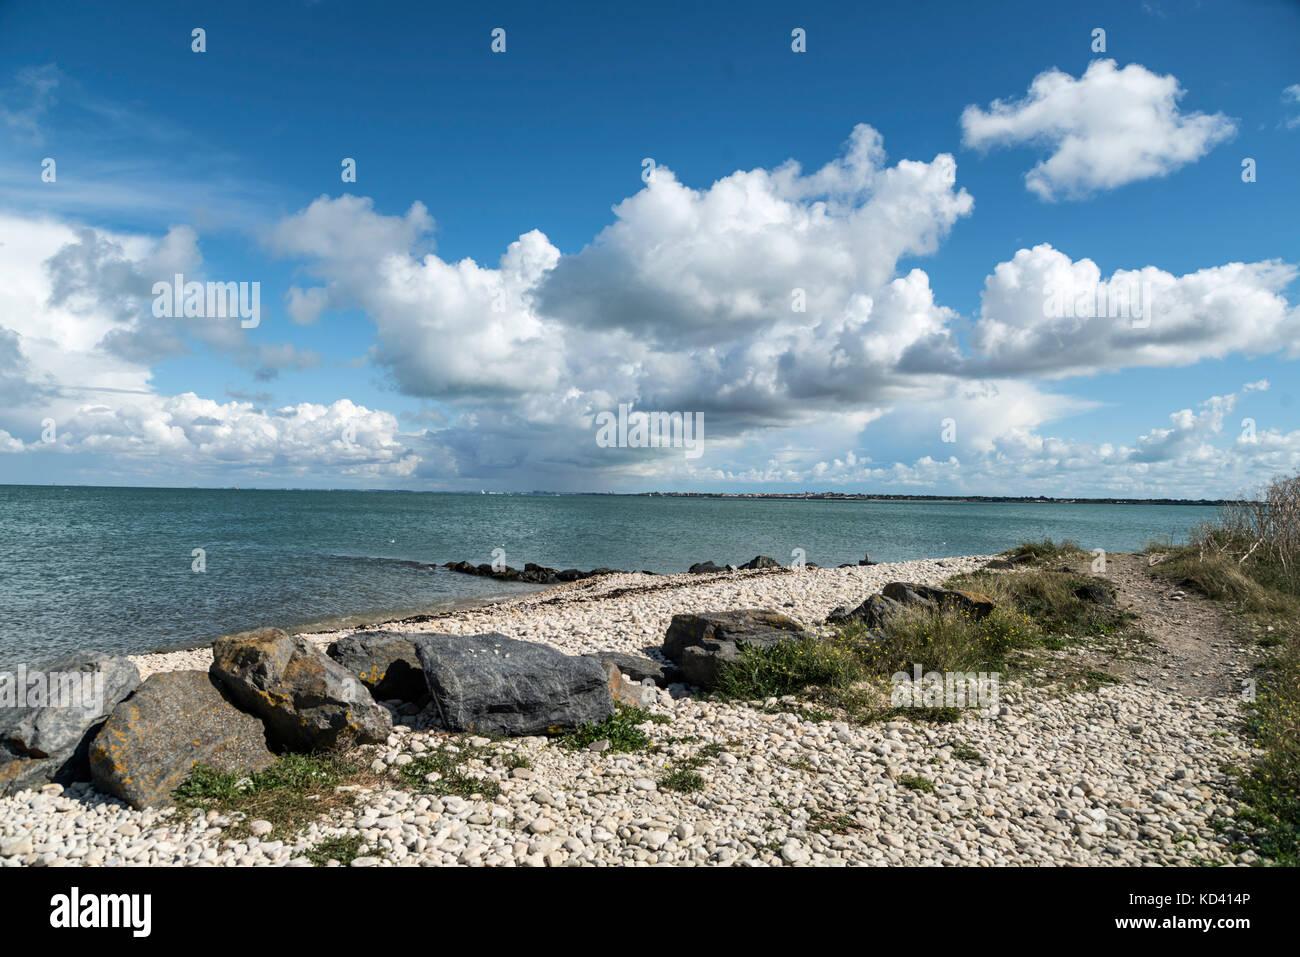 clouds, Ile de Re, Nouvelle-Aquitaine, french westcoast, france, - Stock Image